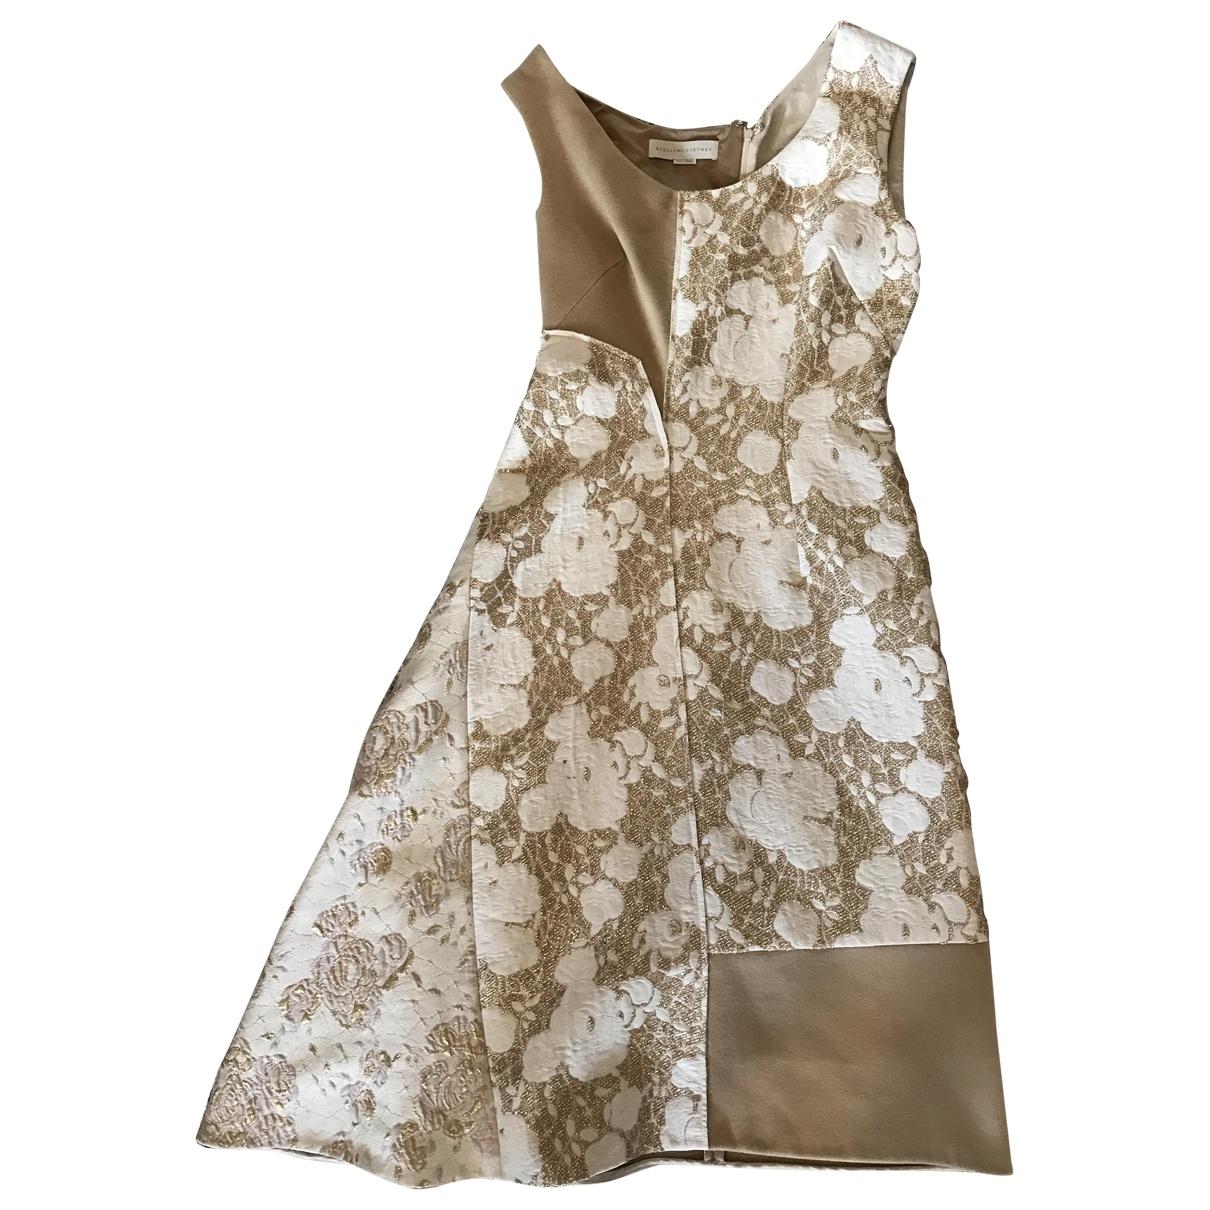 Stella Mccartney \N Kleid in  Beige Wolle